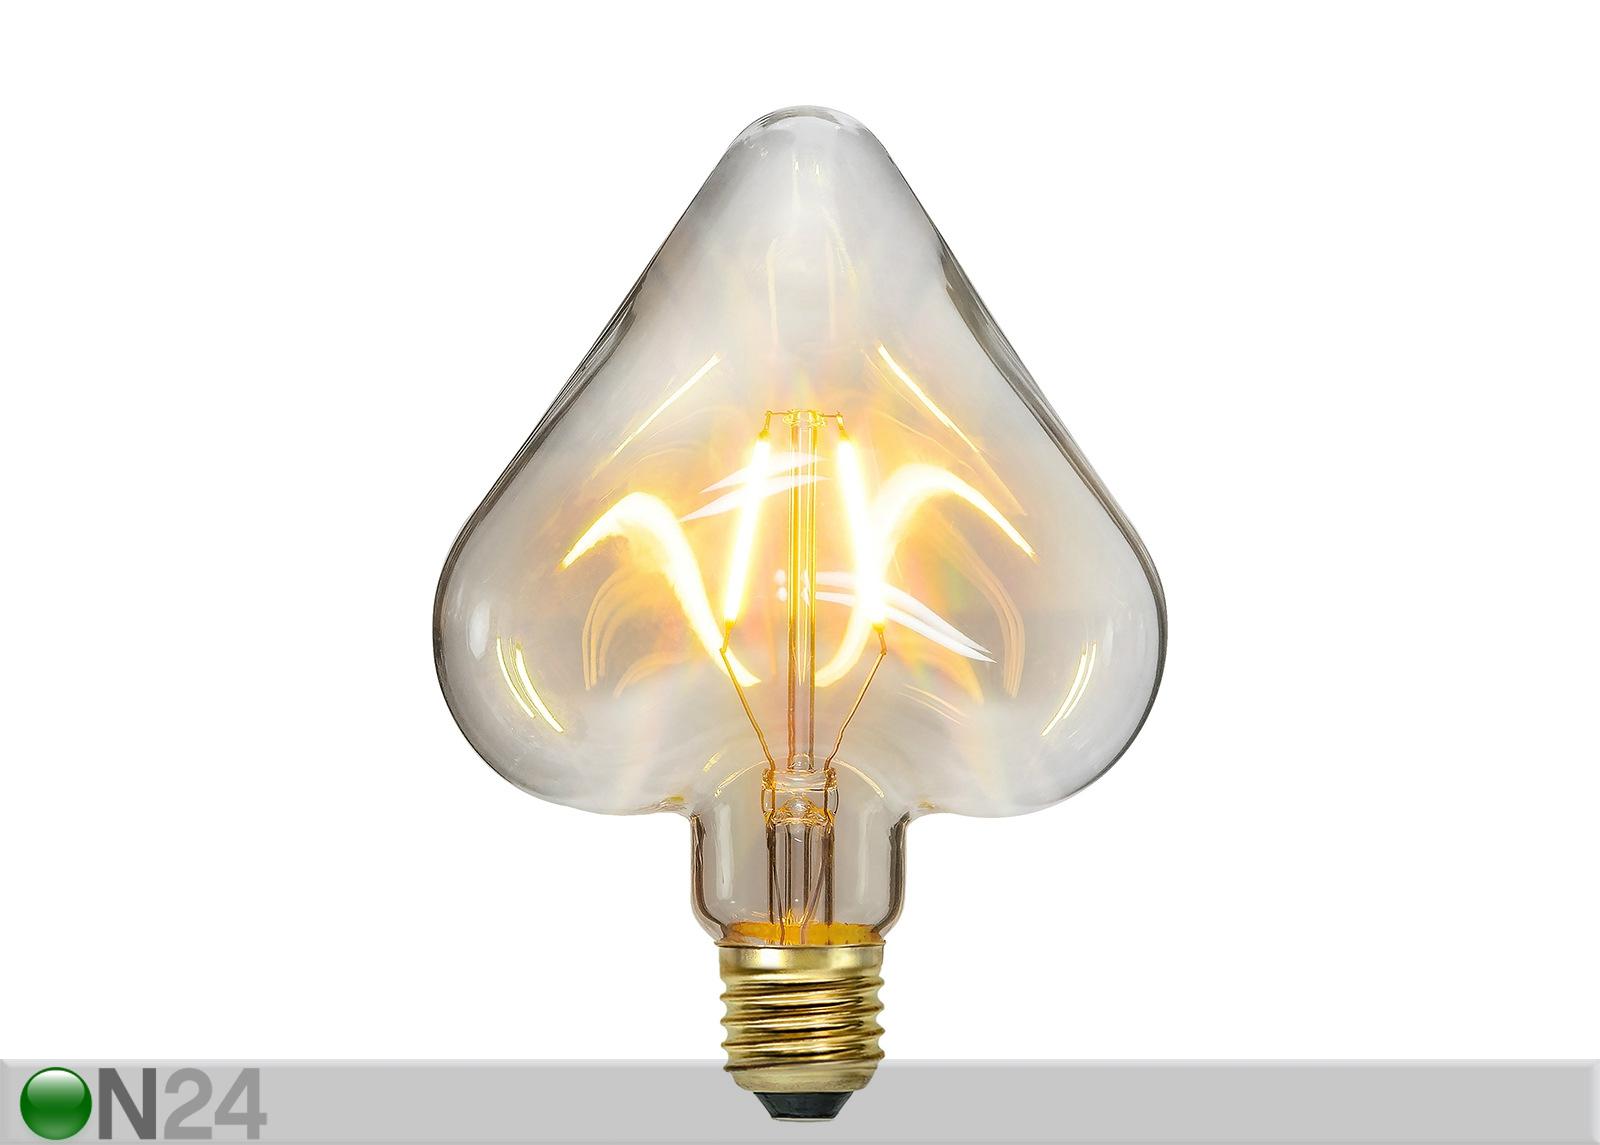 4d6df8d6bb4 Dekoratiivne LED pirn E27 1,4 W AA-142528 - ON24 Sisustuskaubamaja